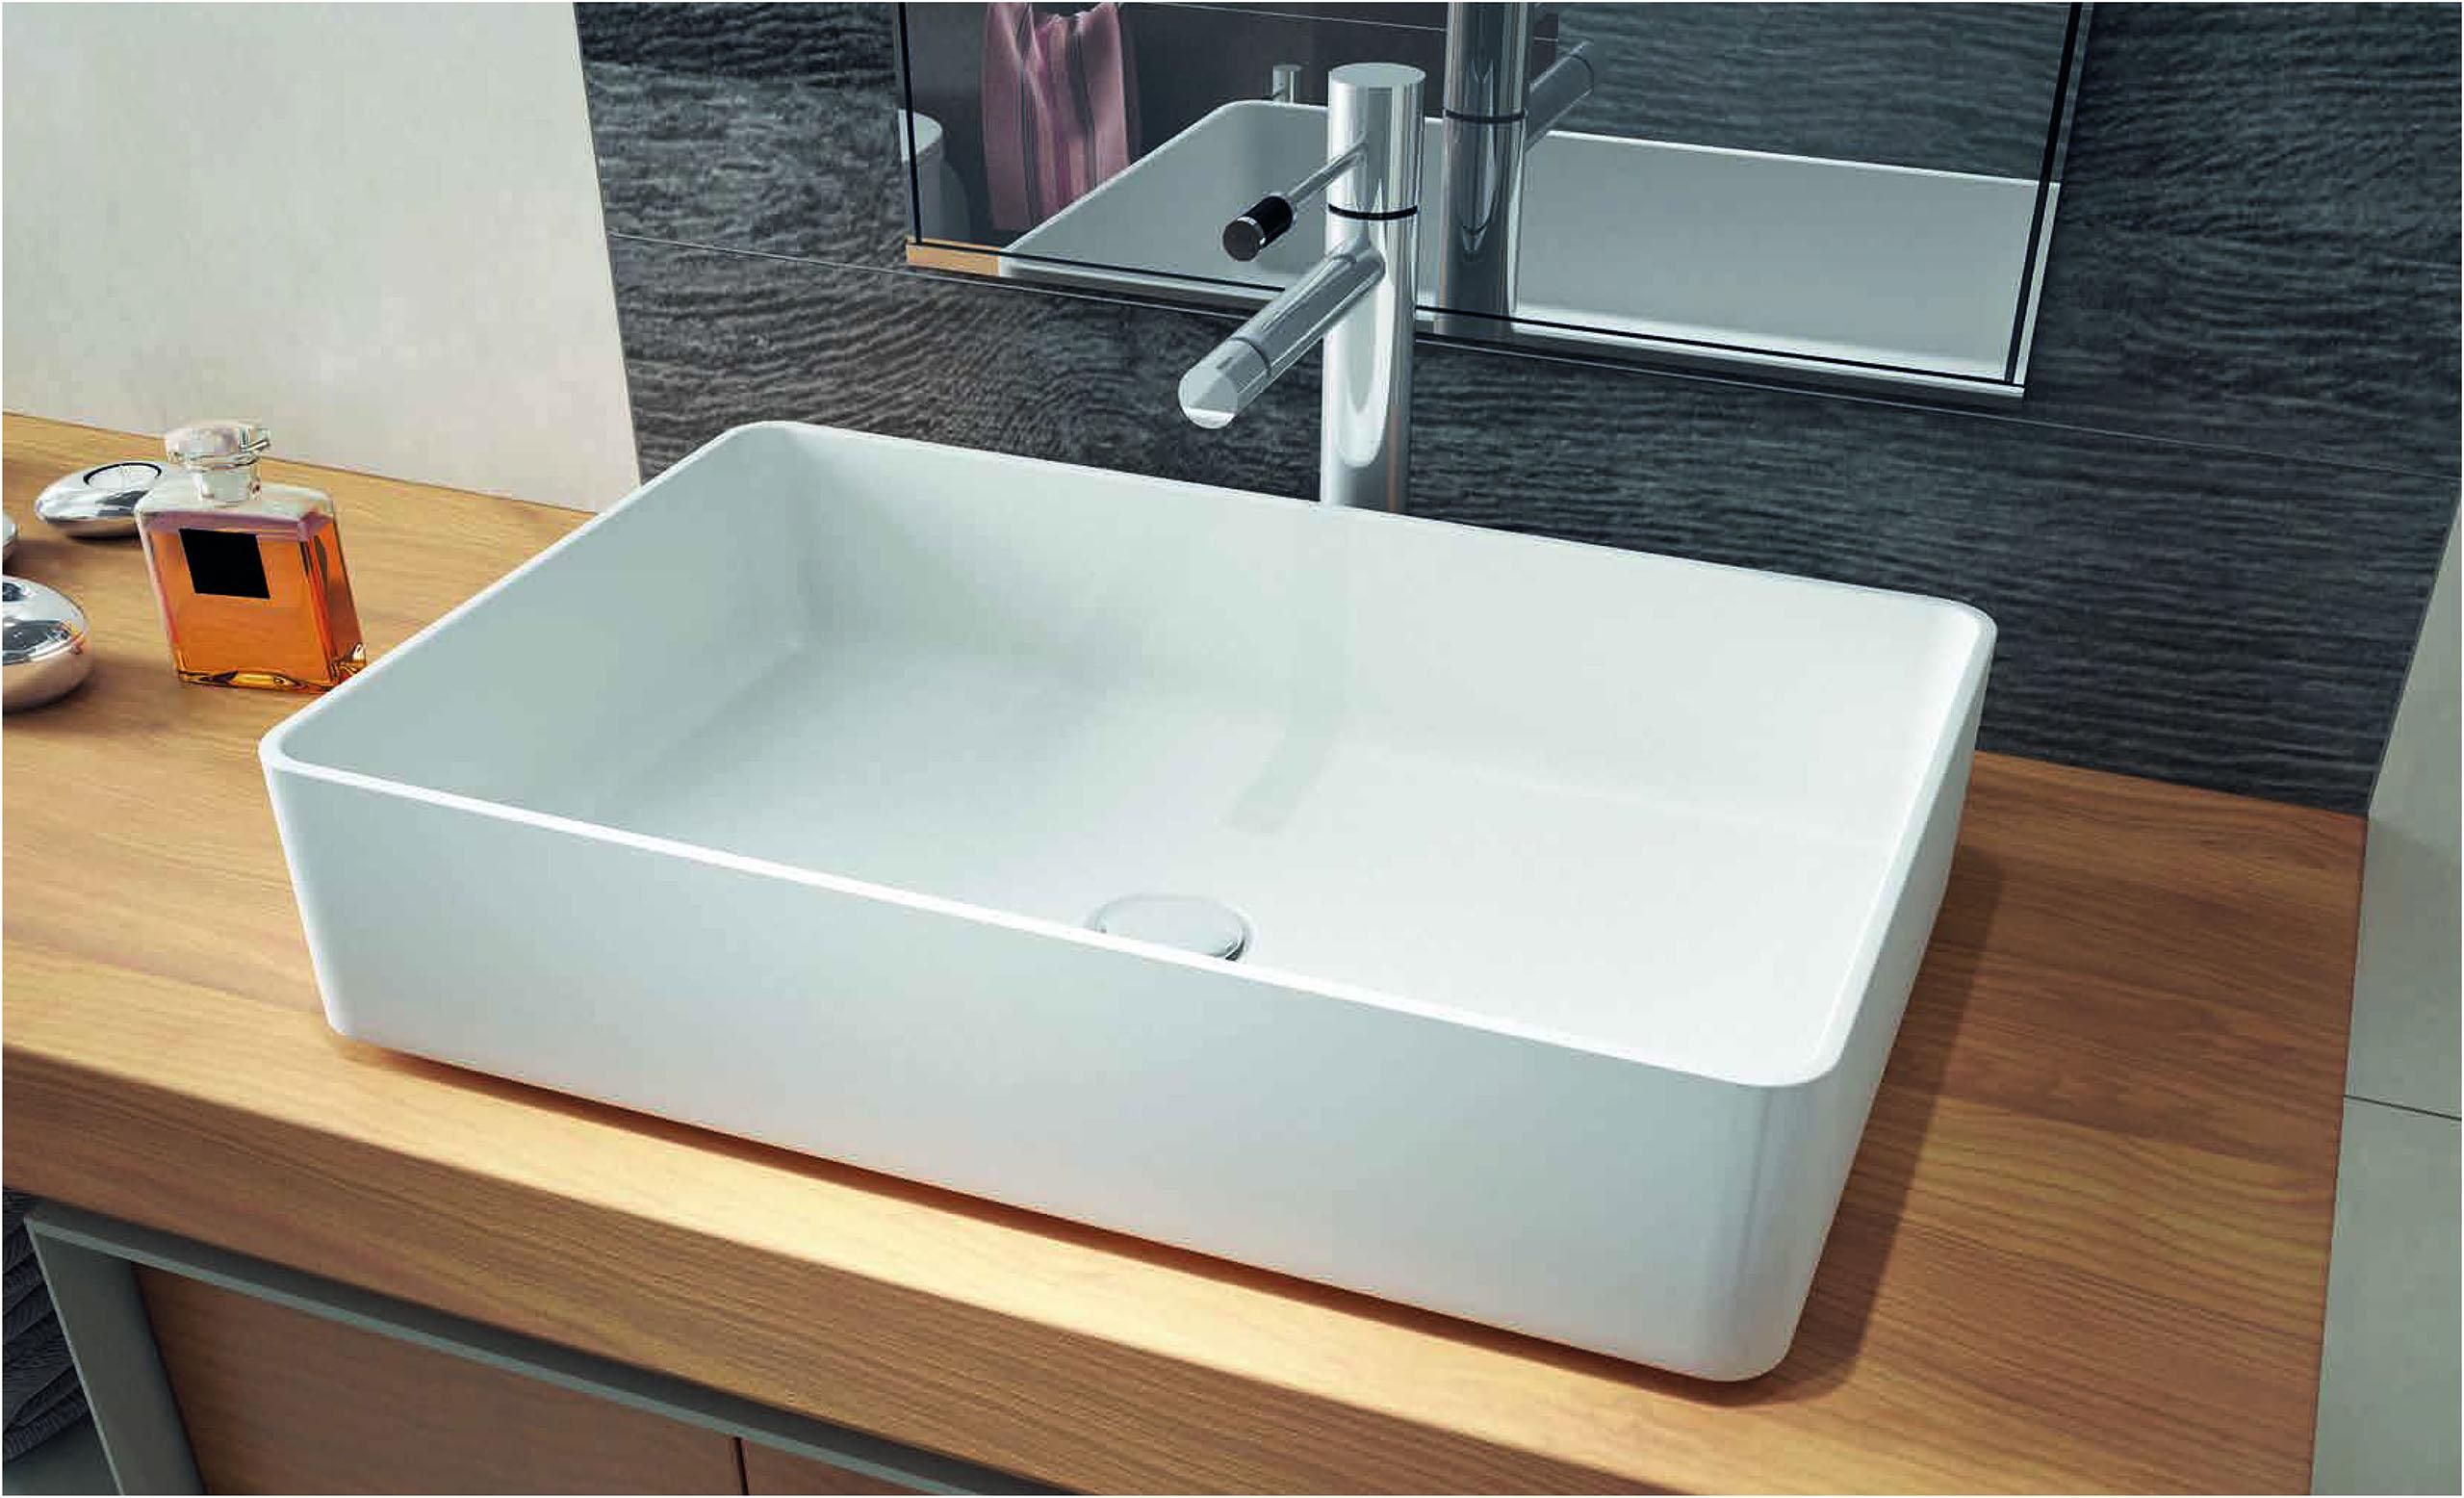 Wasbakken aqua linea badkamers